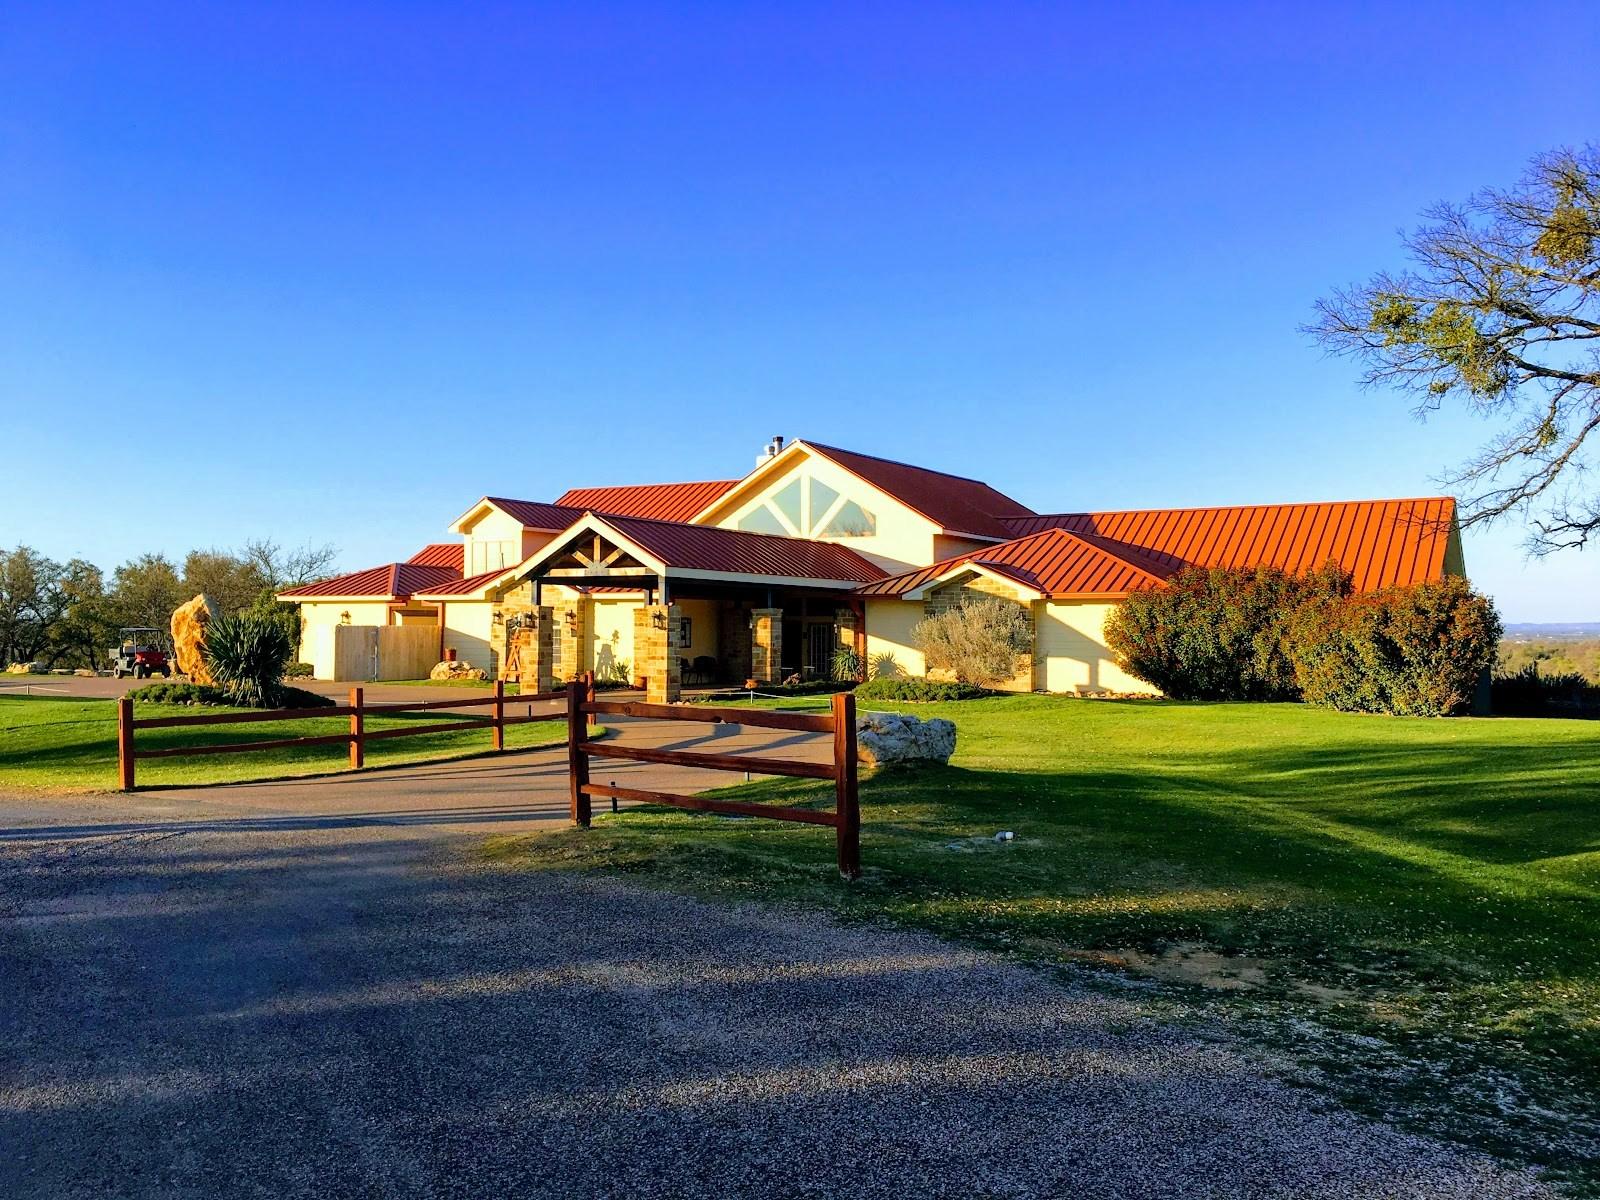 HOMESITE IN KING'S POINT COVE NEAR LAKE BROWNWOOD, TX